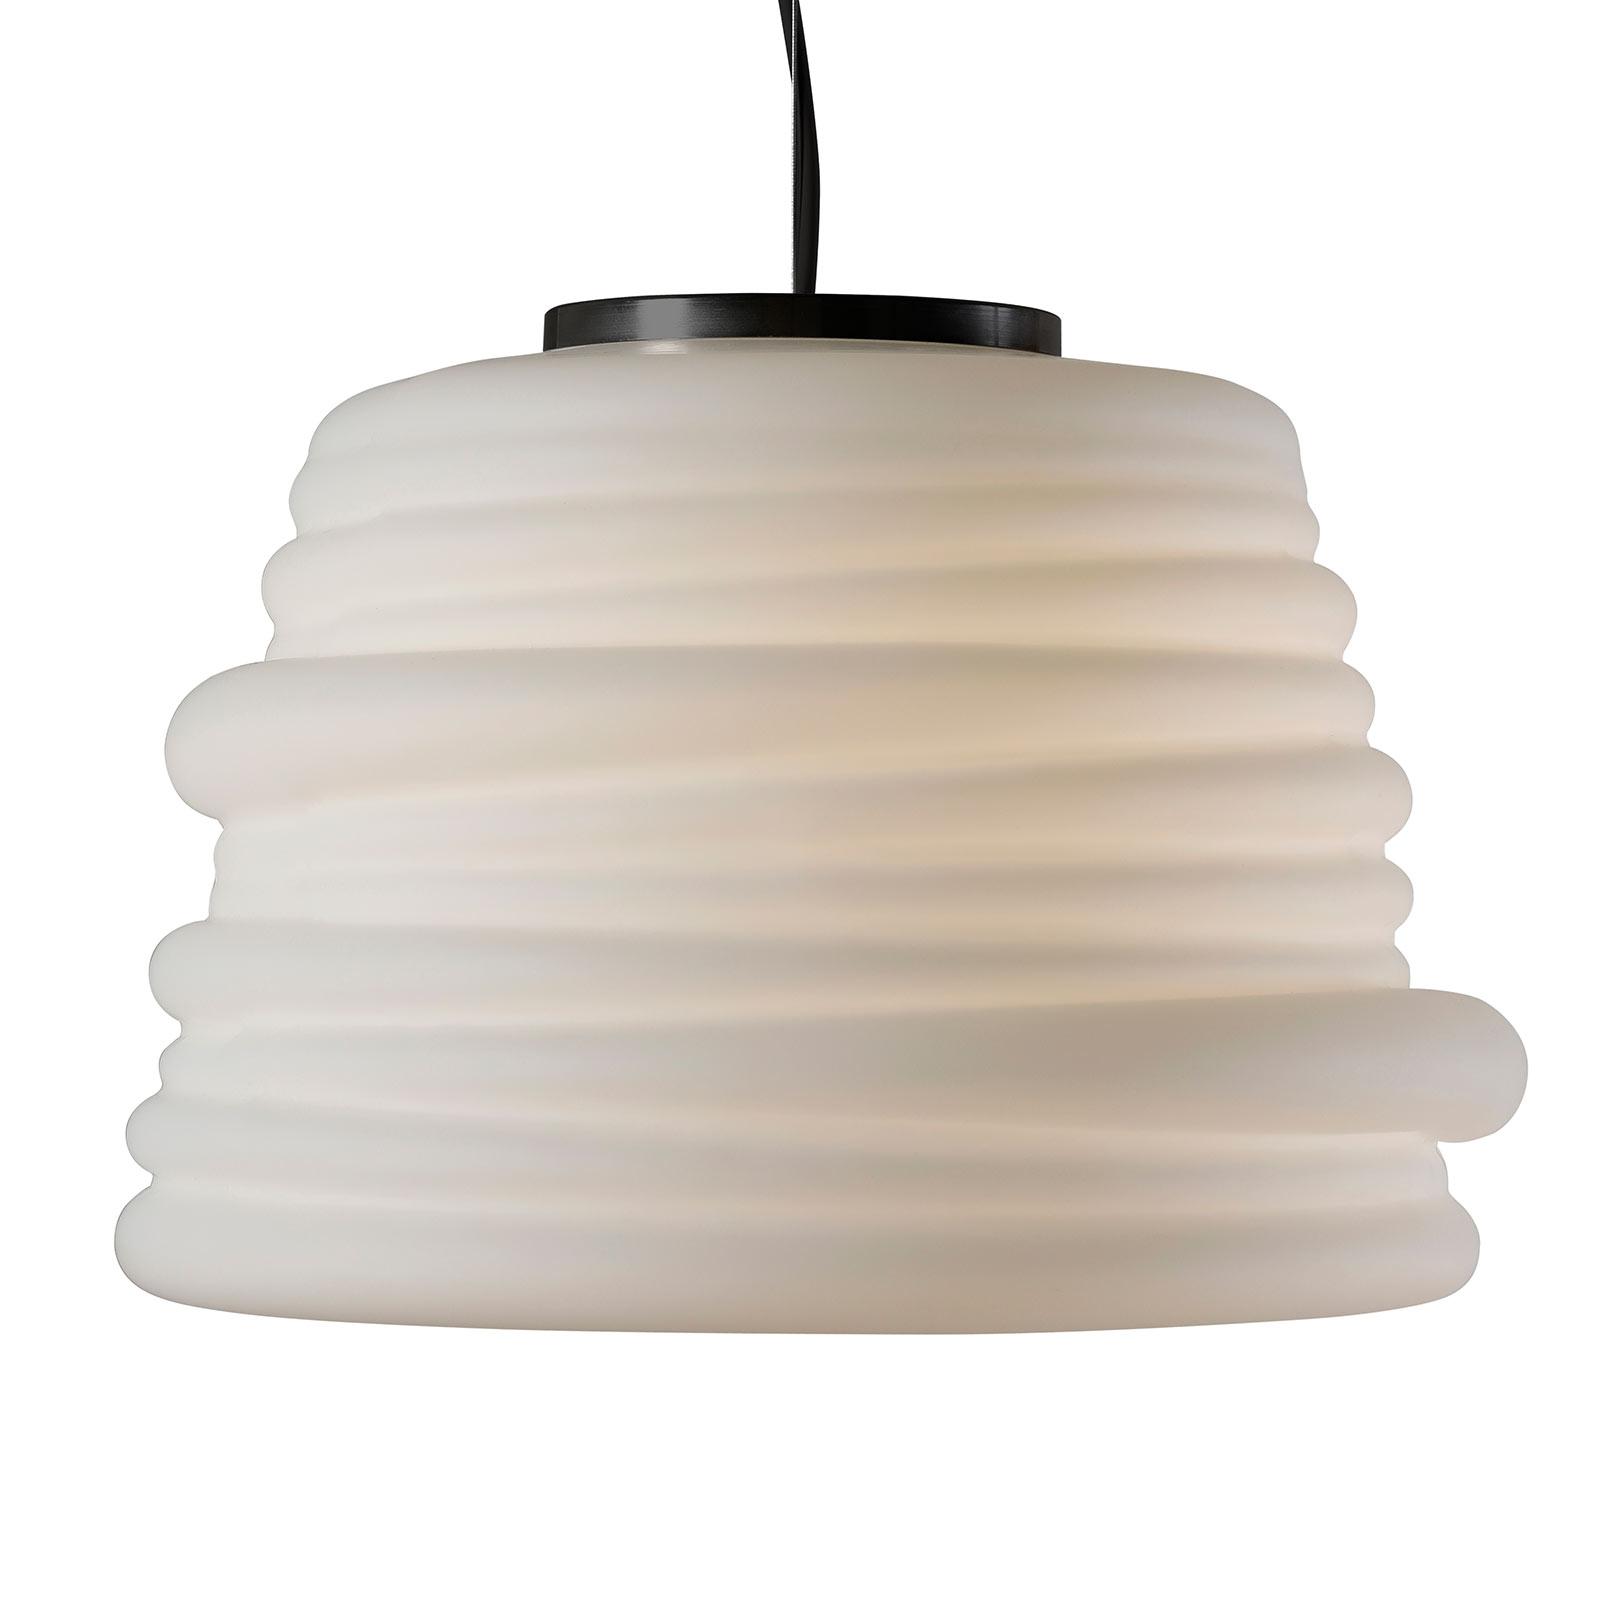 Karman Bibendum LED hanglamp, Ø 35 cm, wit